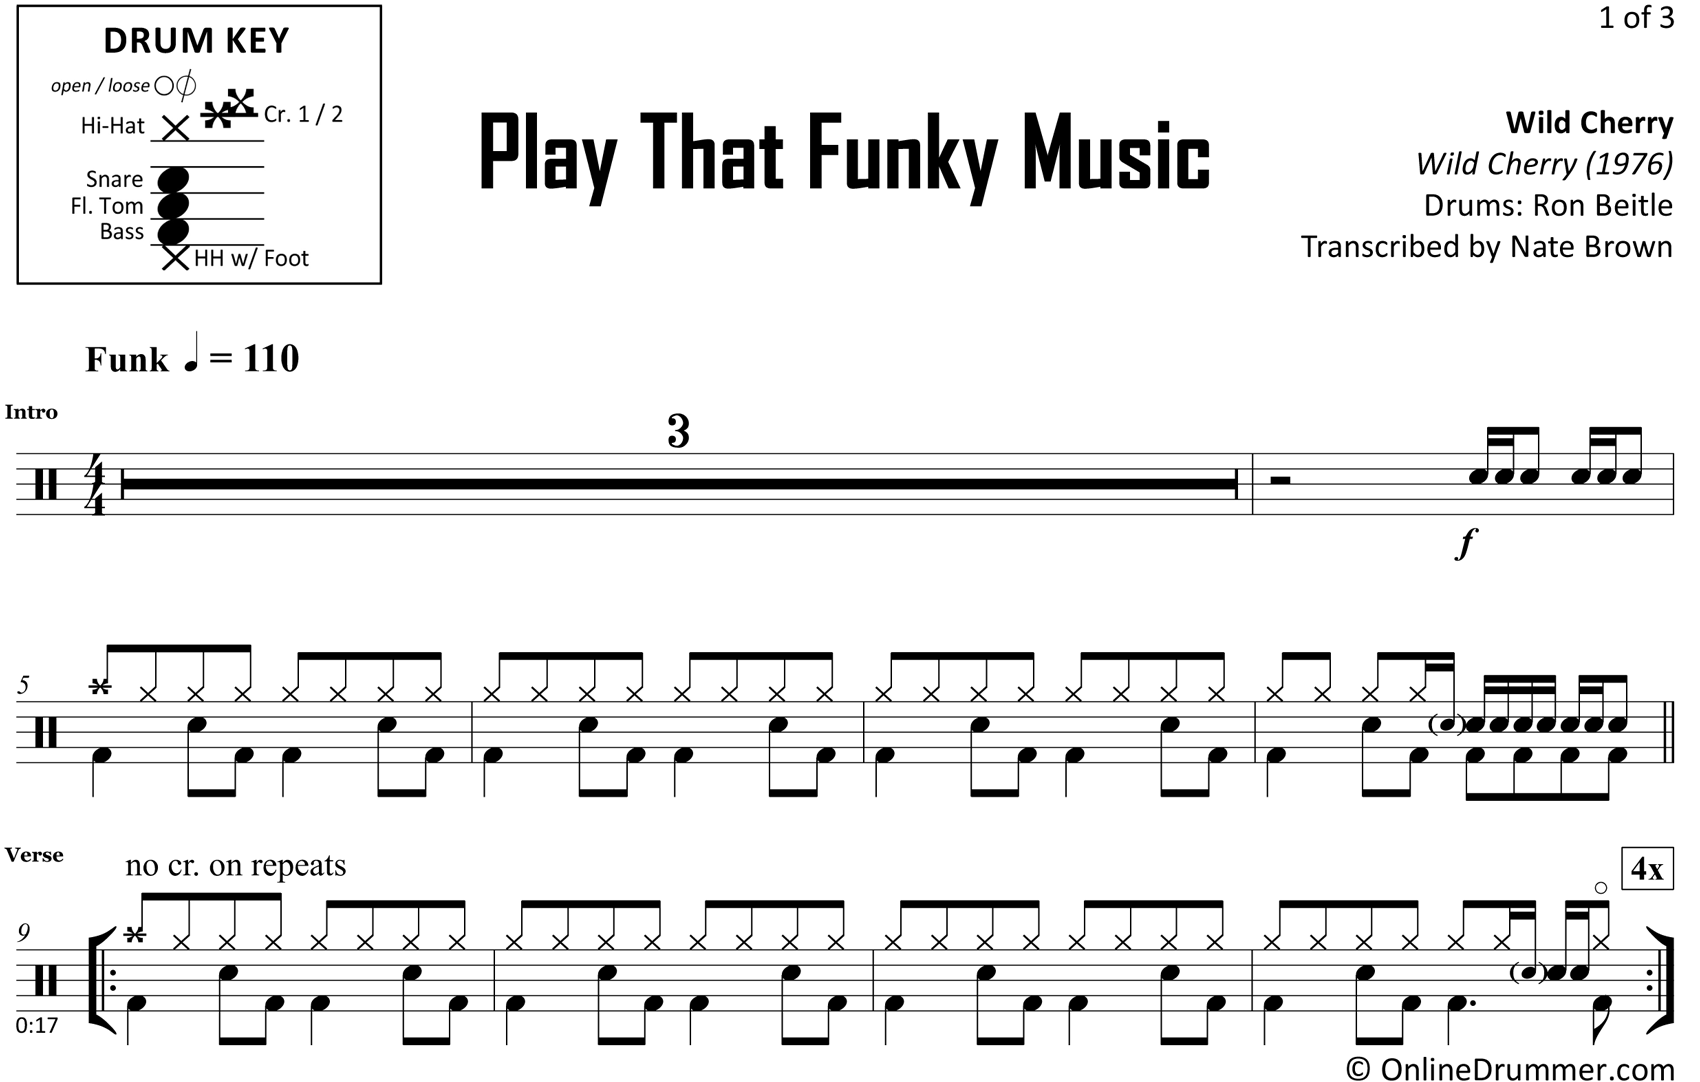 Play That Funky Music - Wild Cherry - Drum Sheet Music